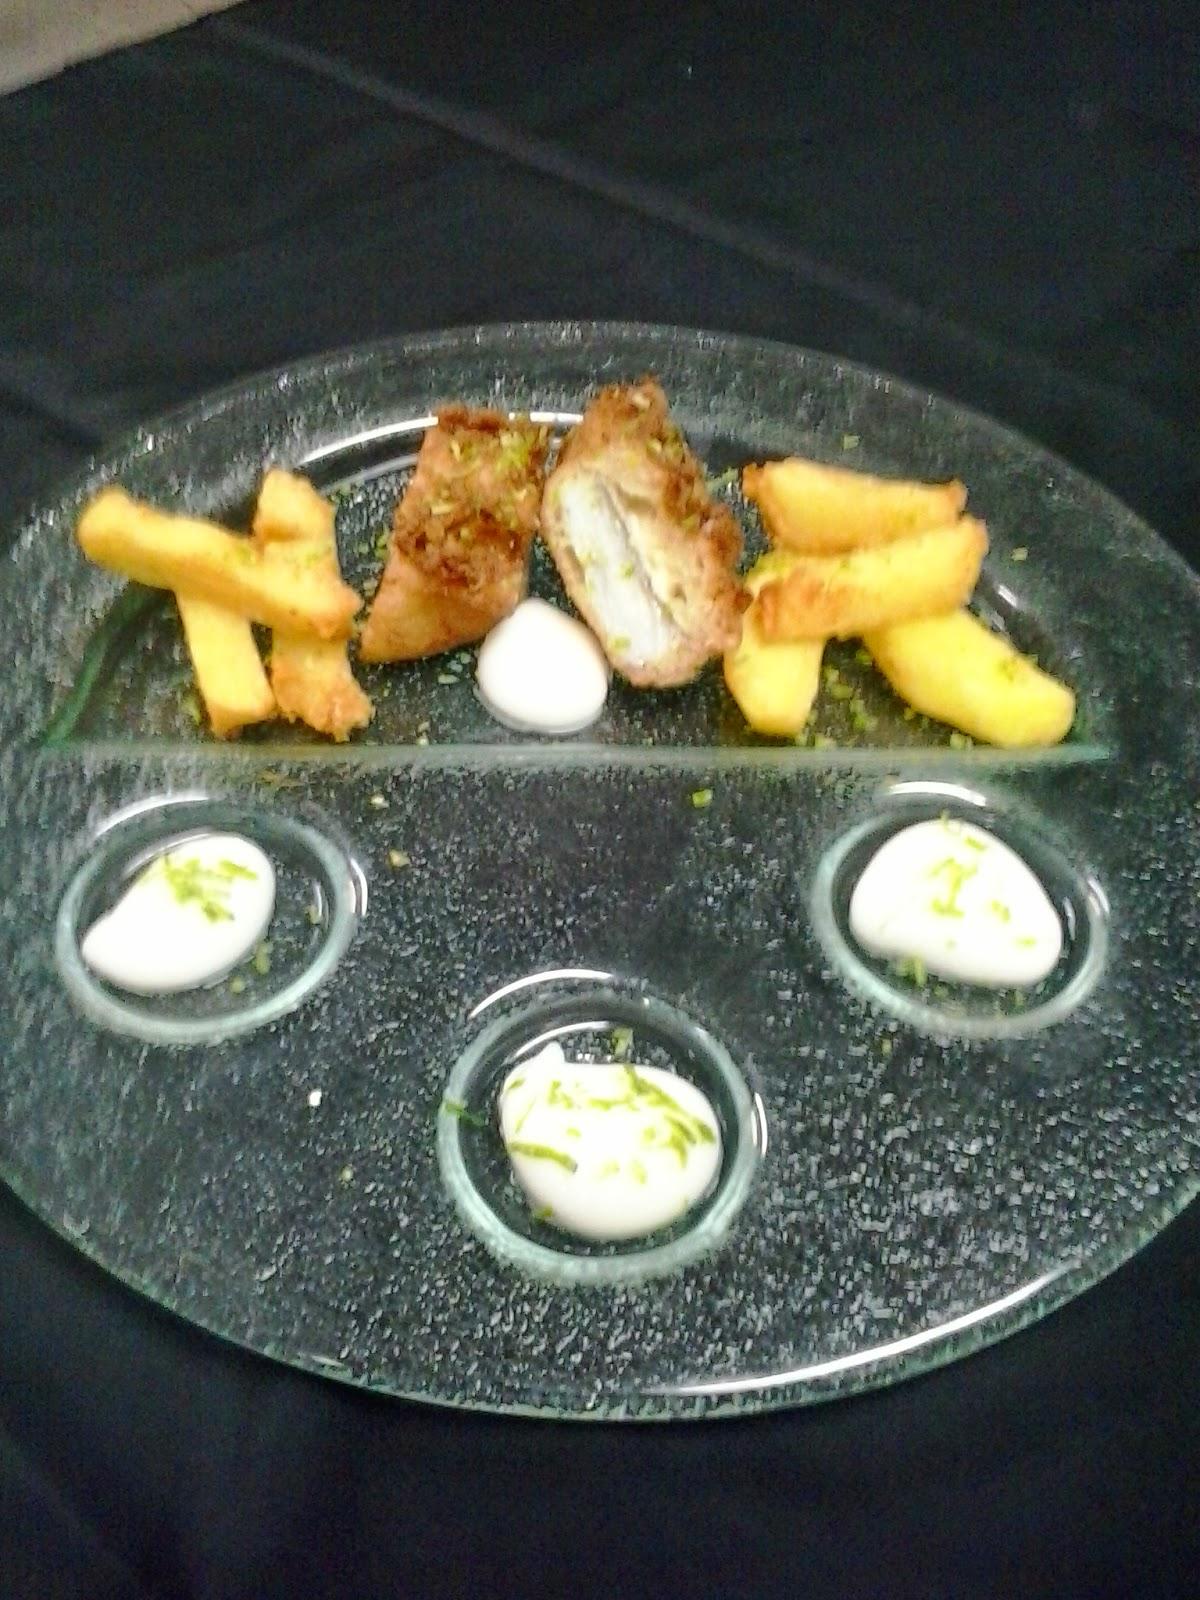 Cocina molecular fish and chips perfection for Evolucion de la cocina molecular